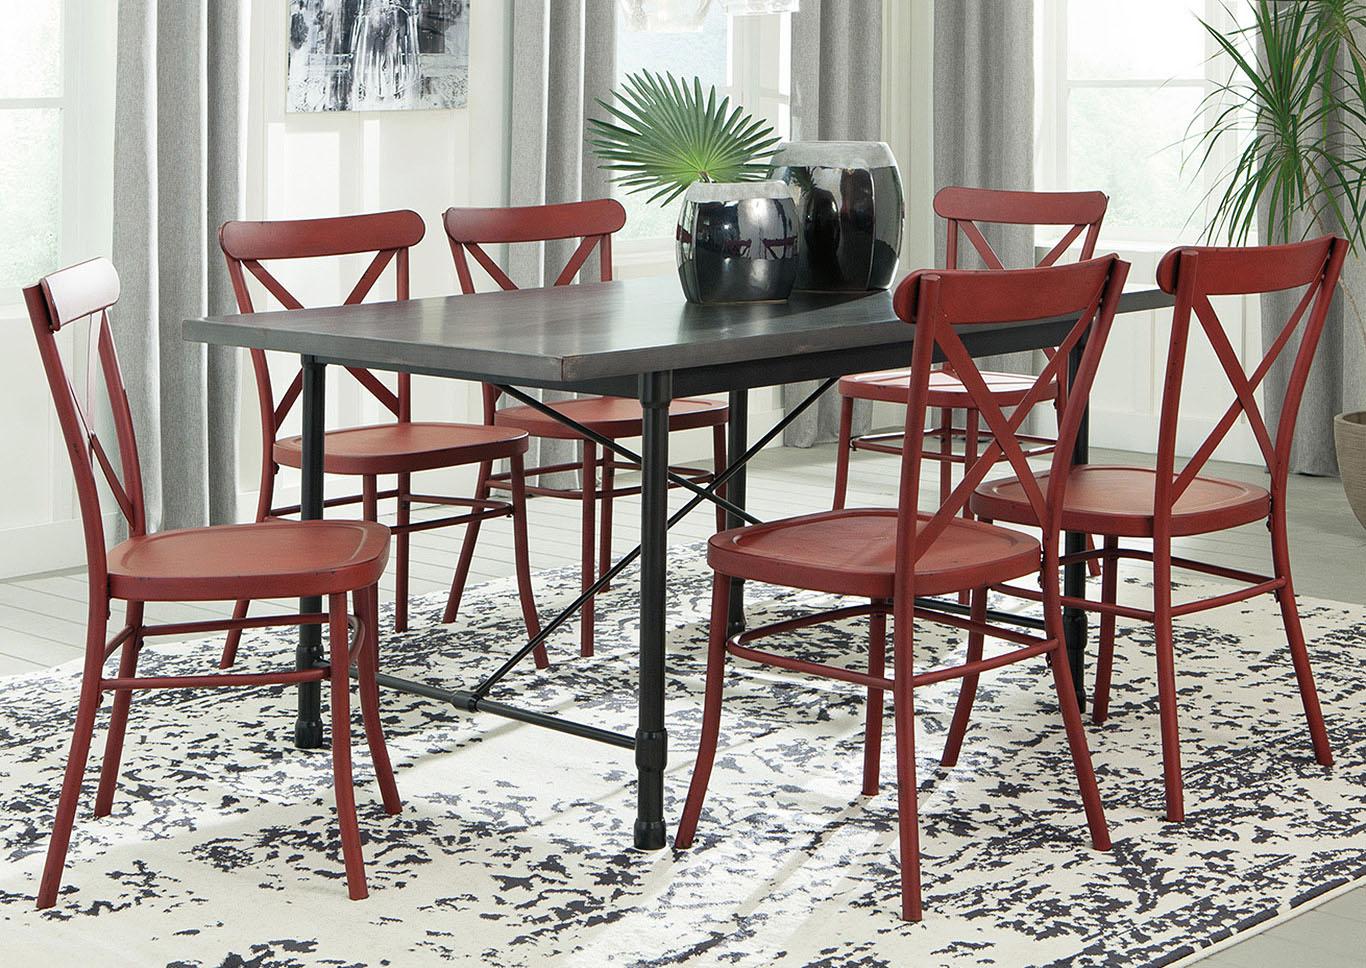 Woodstock Furniture Value Center Minnona Aged Steel Rectangular - Aged wood dining table